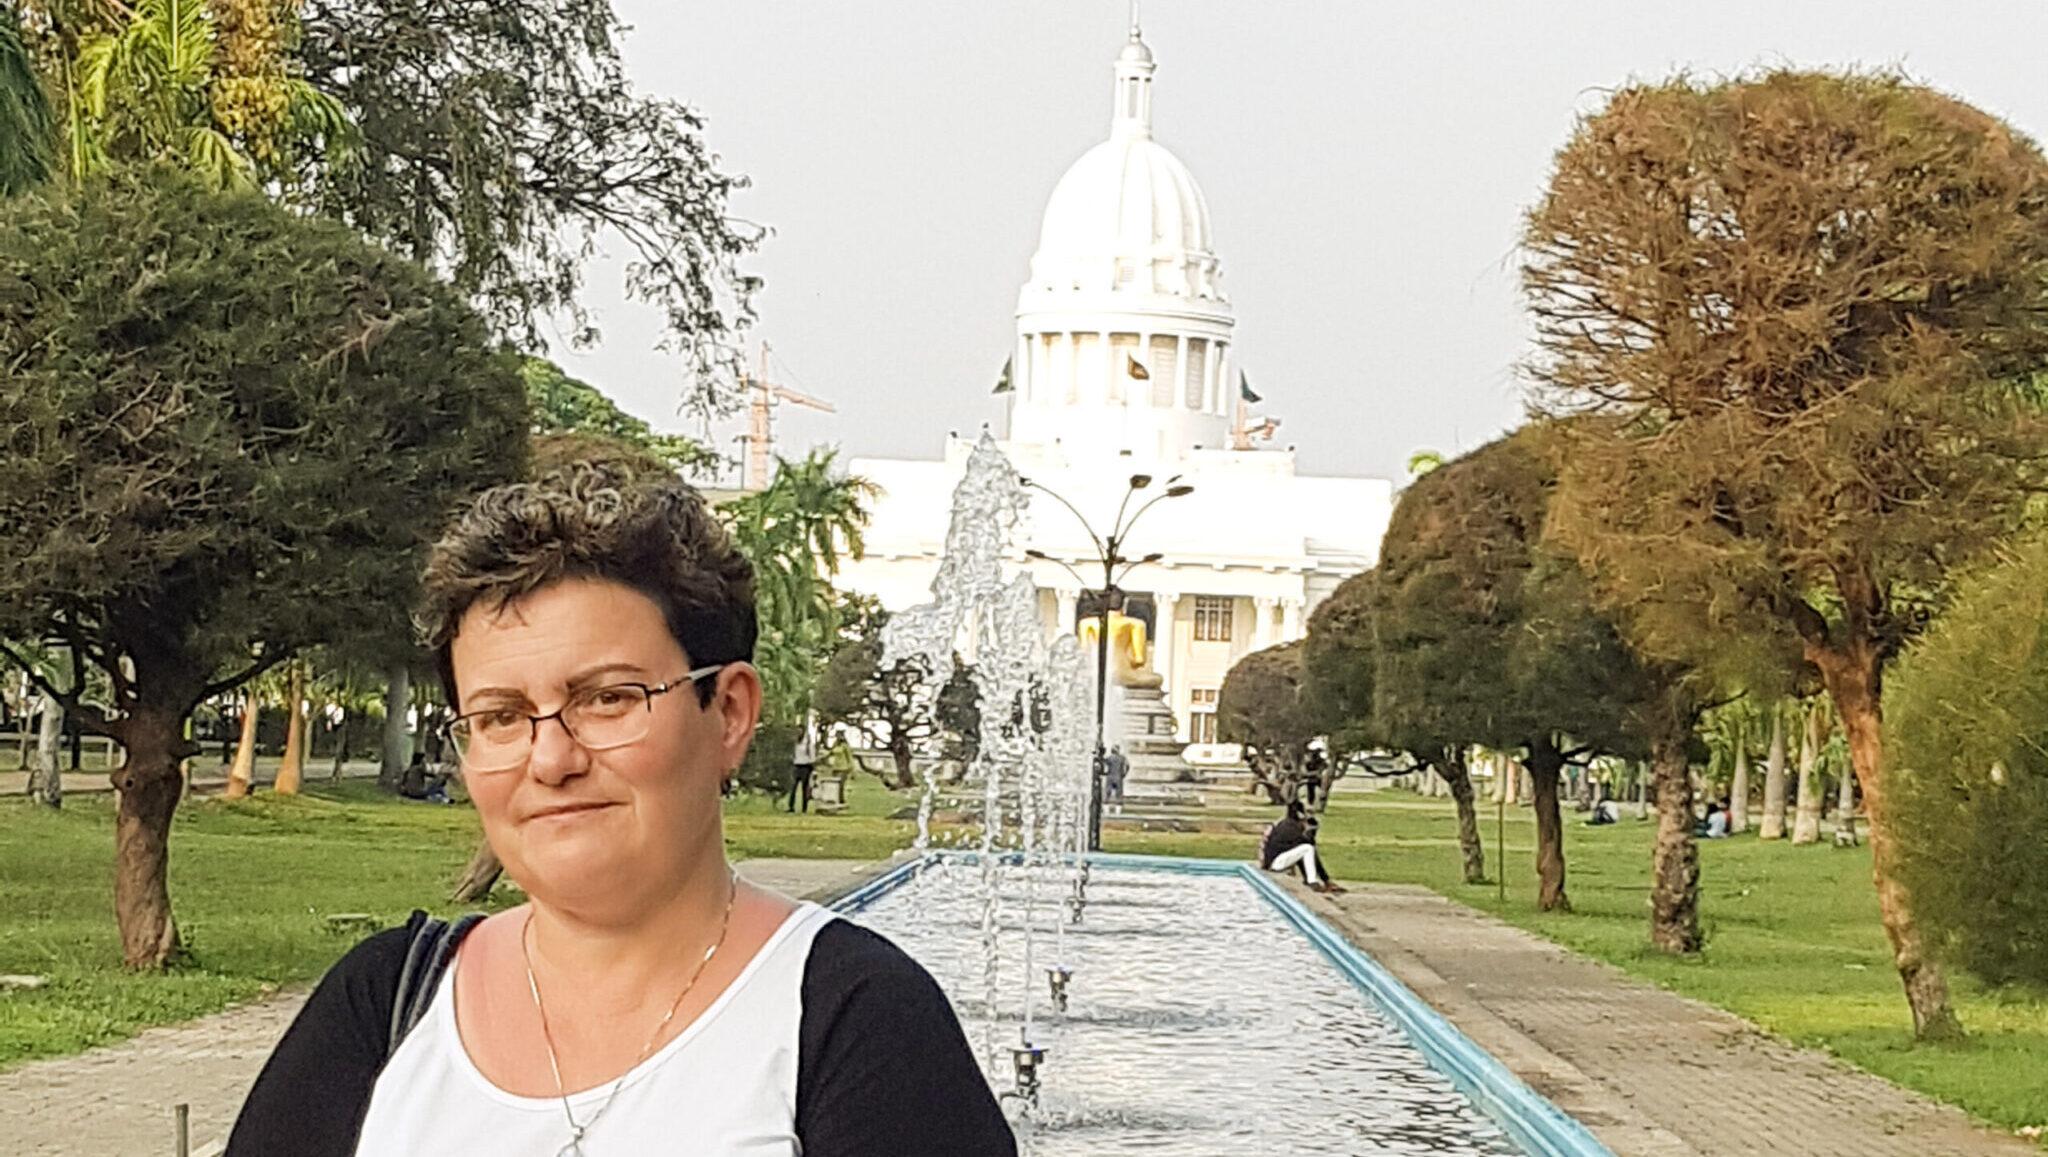 Муниципалитет Коломбо